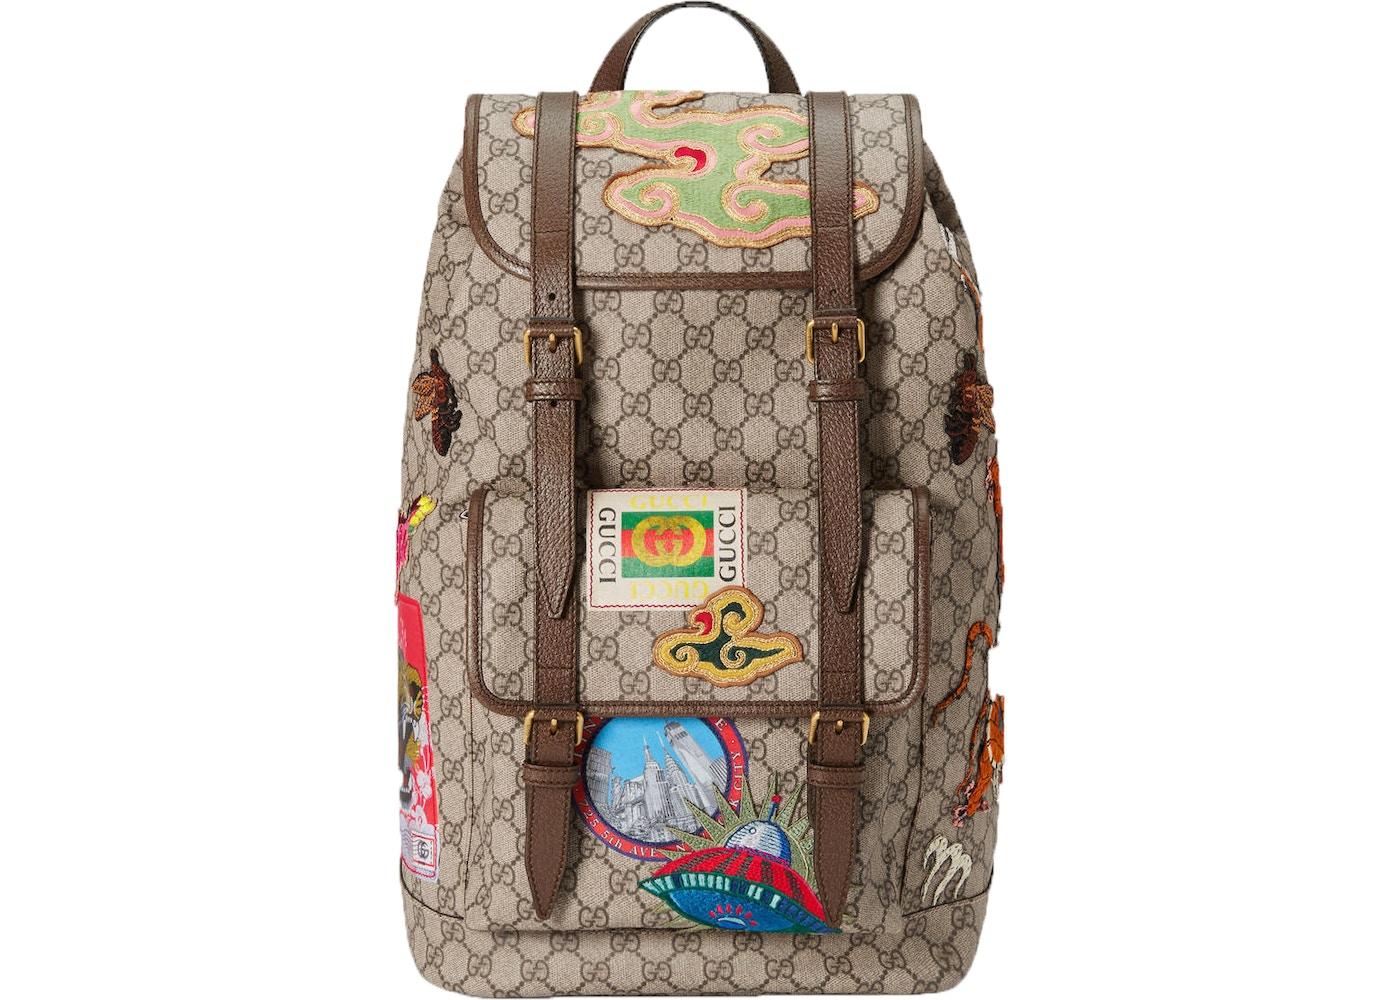 a5f48b778 Buy & Sell Gucci Other Handbags - Highest Bid